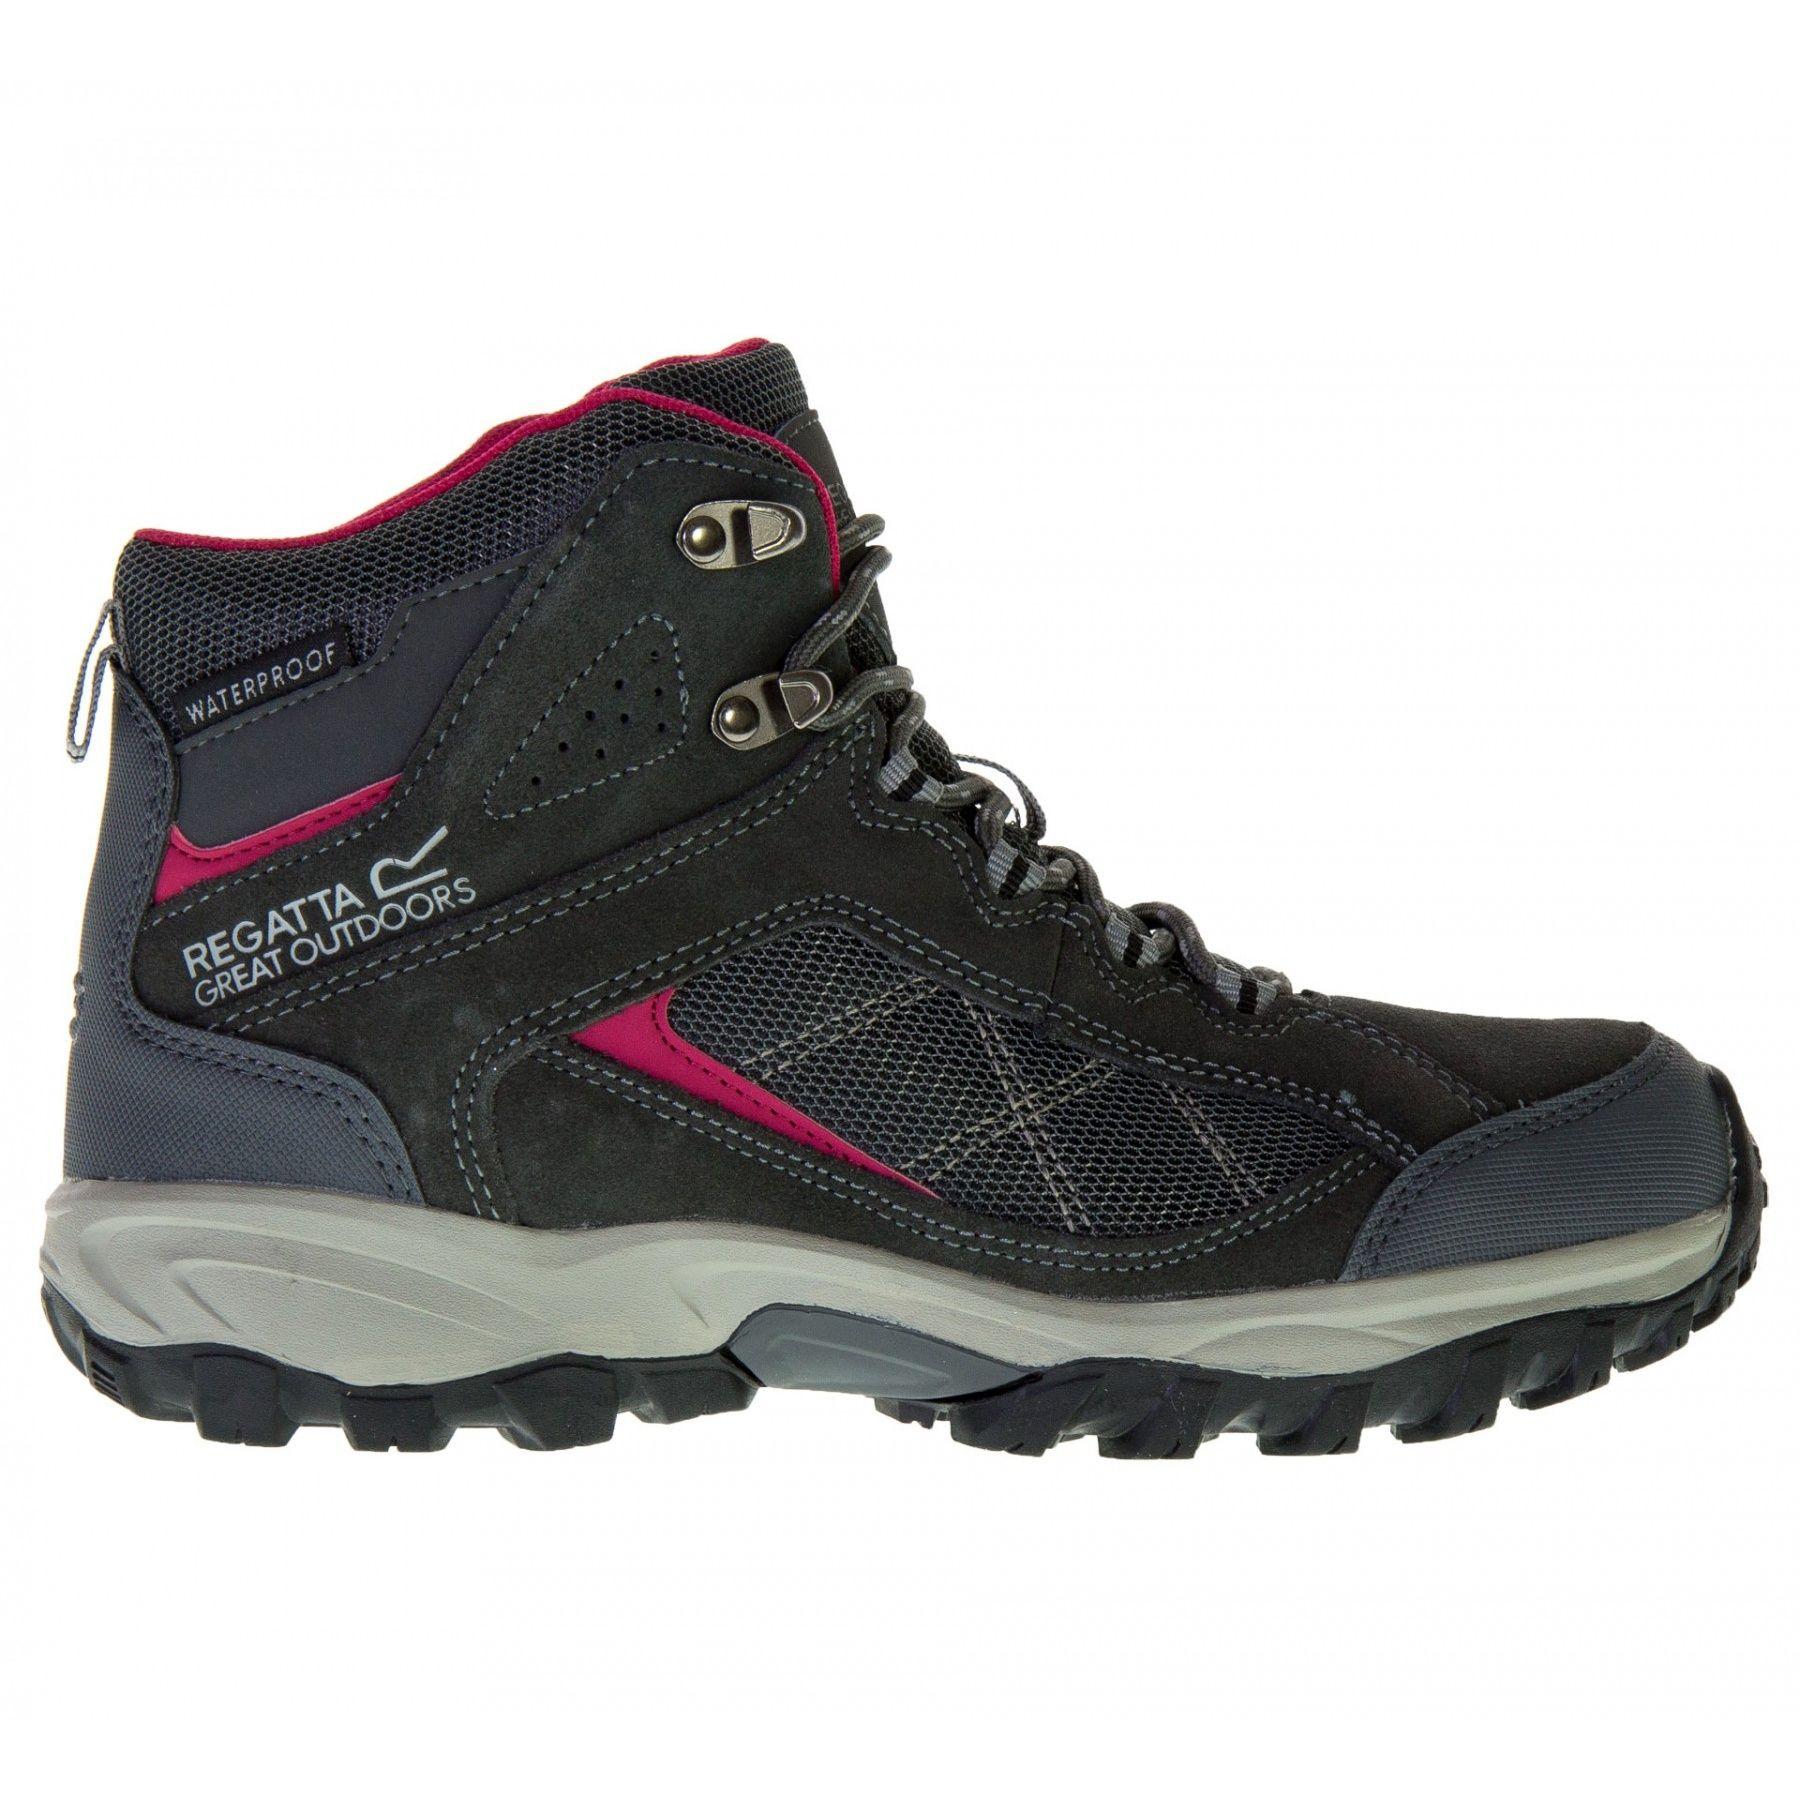 Regatta Great Outdoors Womens/Ladies Lady Clydebank Waterproof Hiking Boots